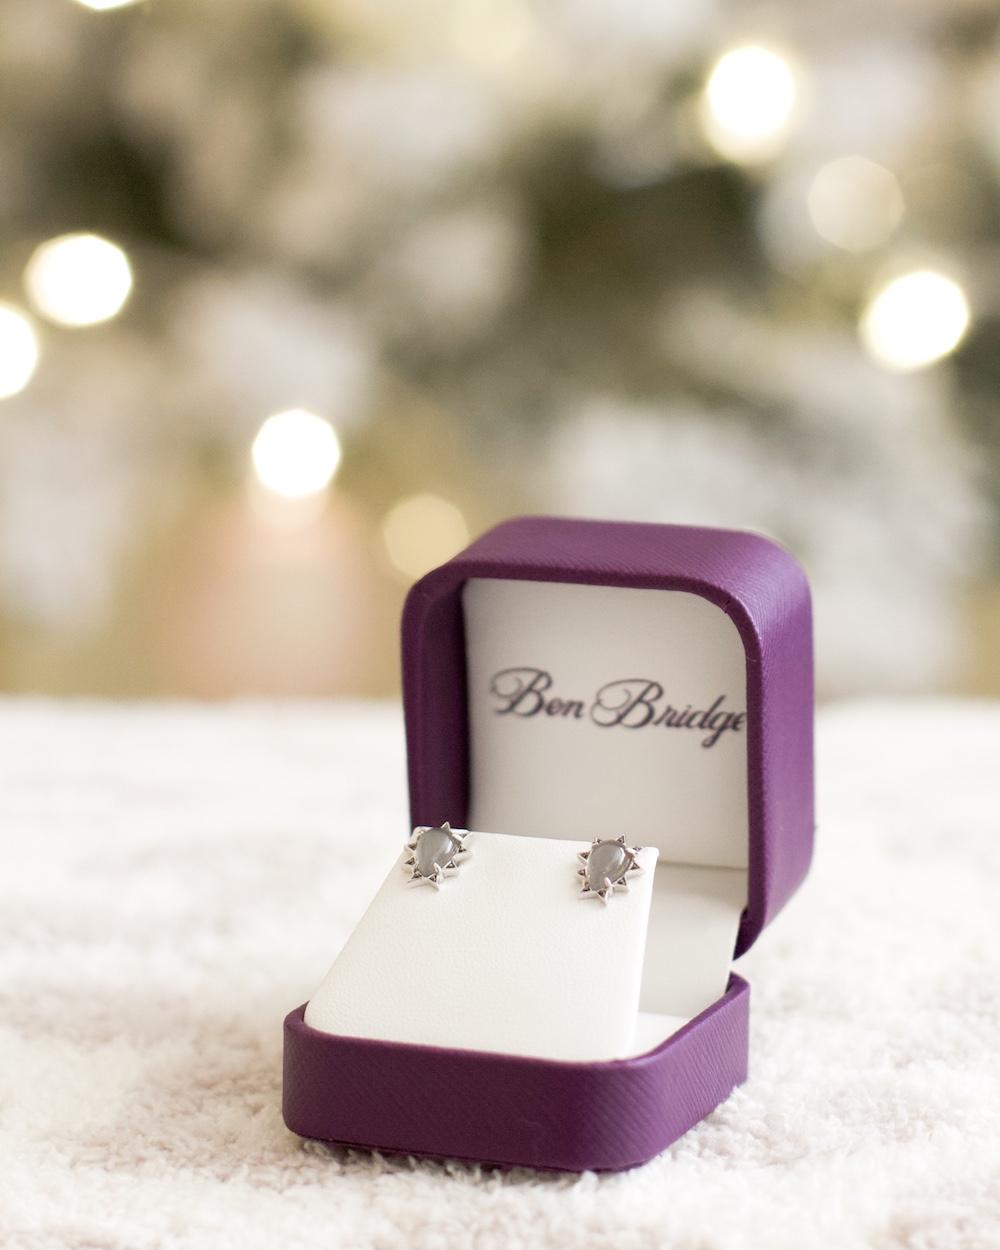 ben bridge brea mall holiday earrings gift